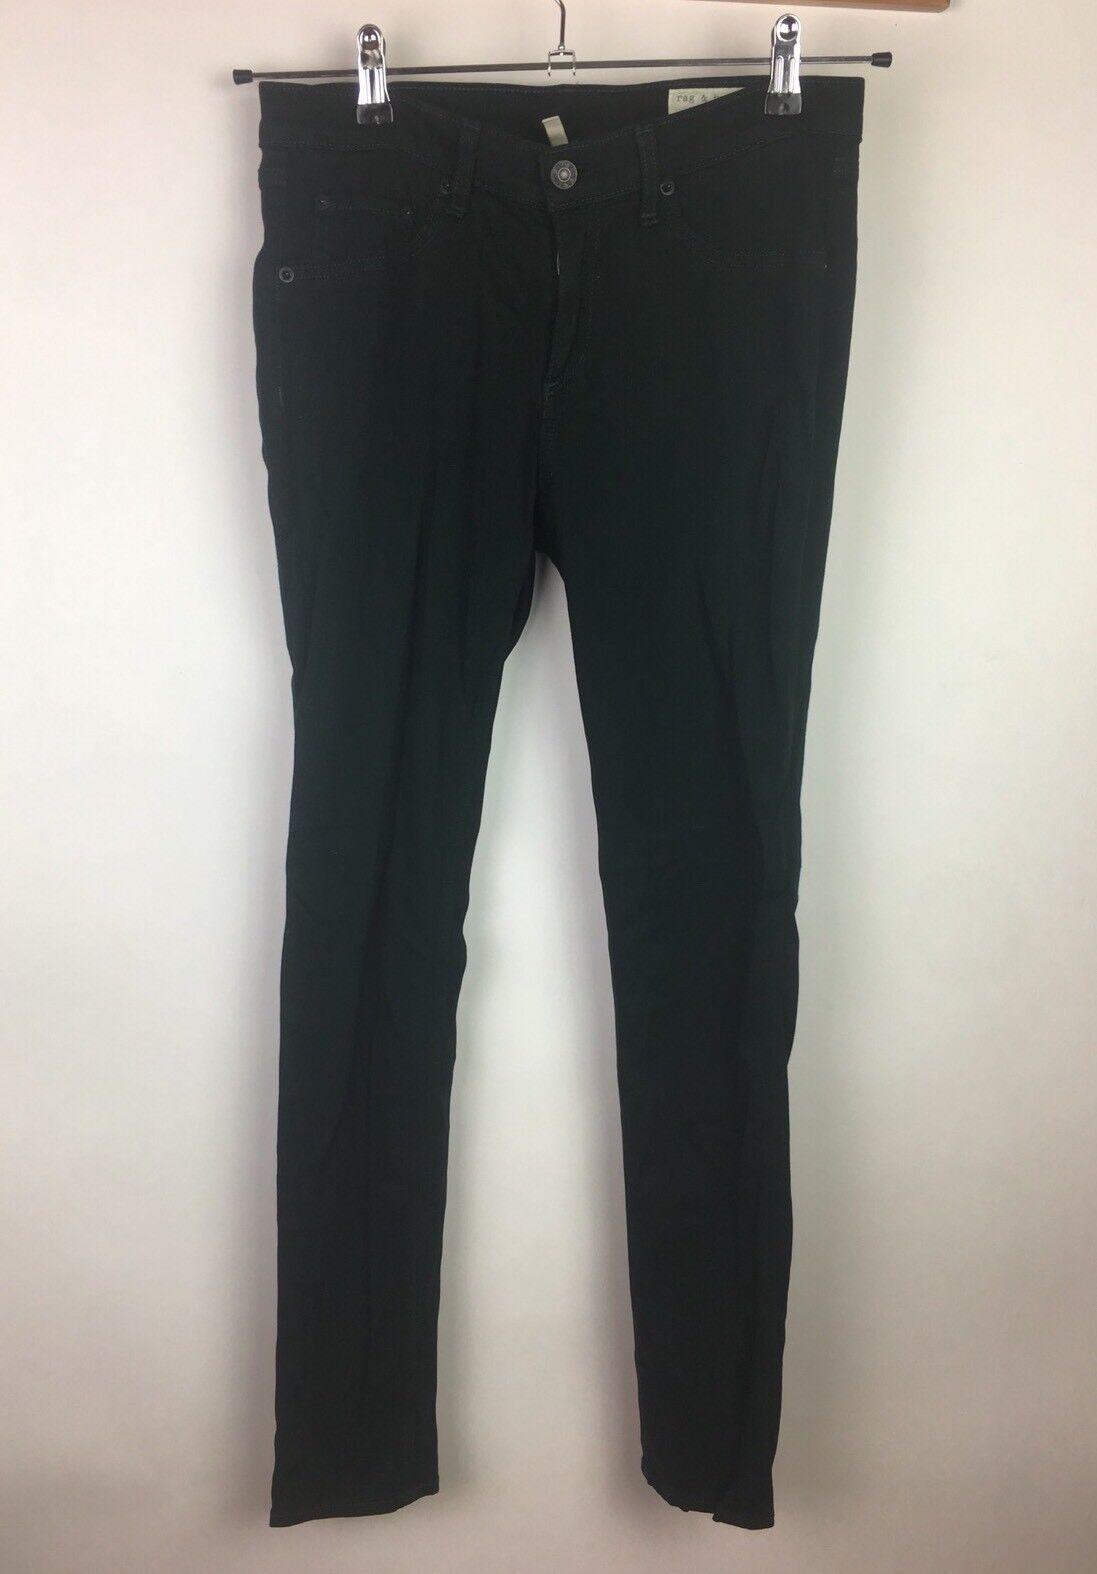 Rag & Bone Legging Pants Size 29 Green Skinny Stretch